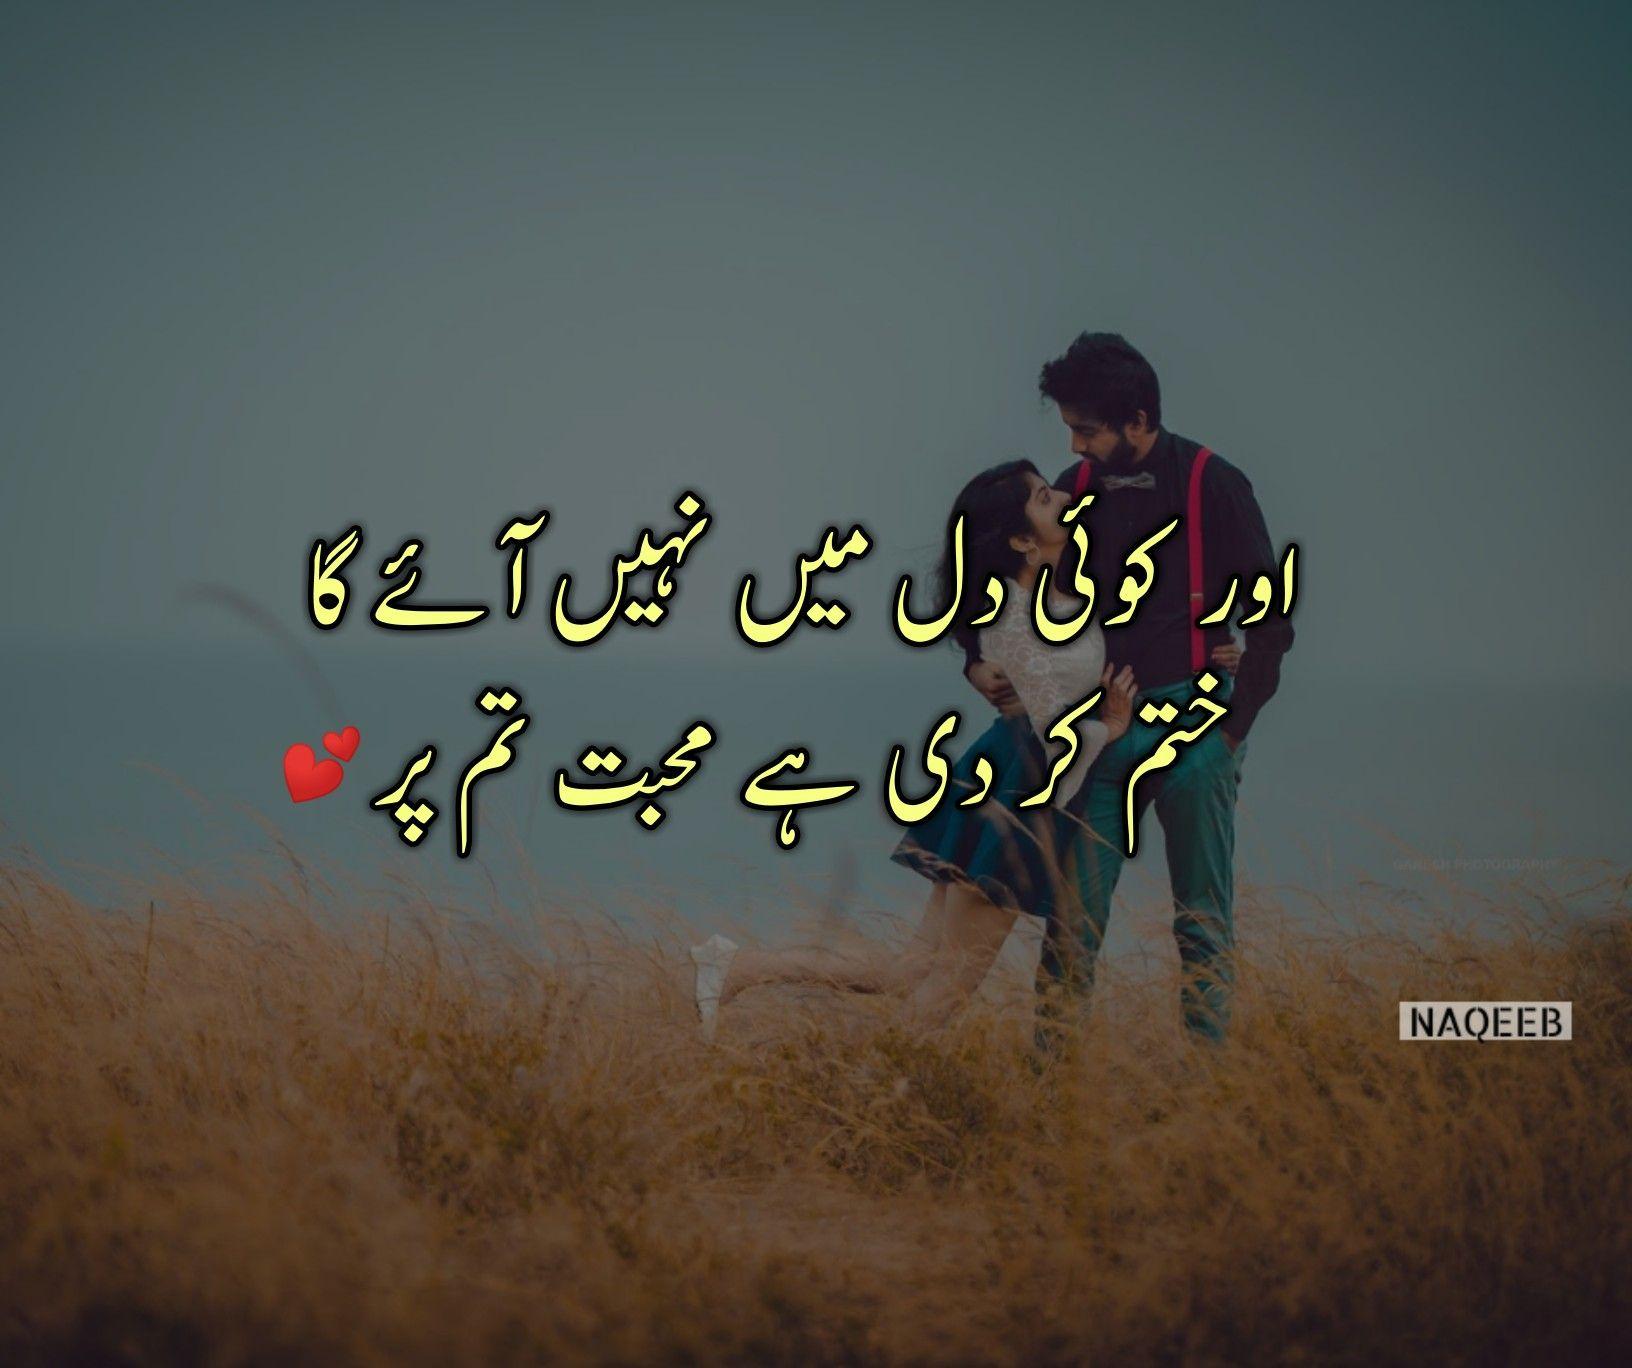 Romantic Love Shayari In Urdu Best Urdu Poetry Images Romantic